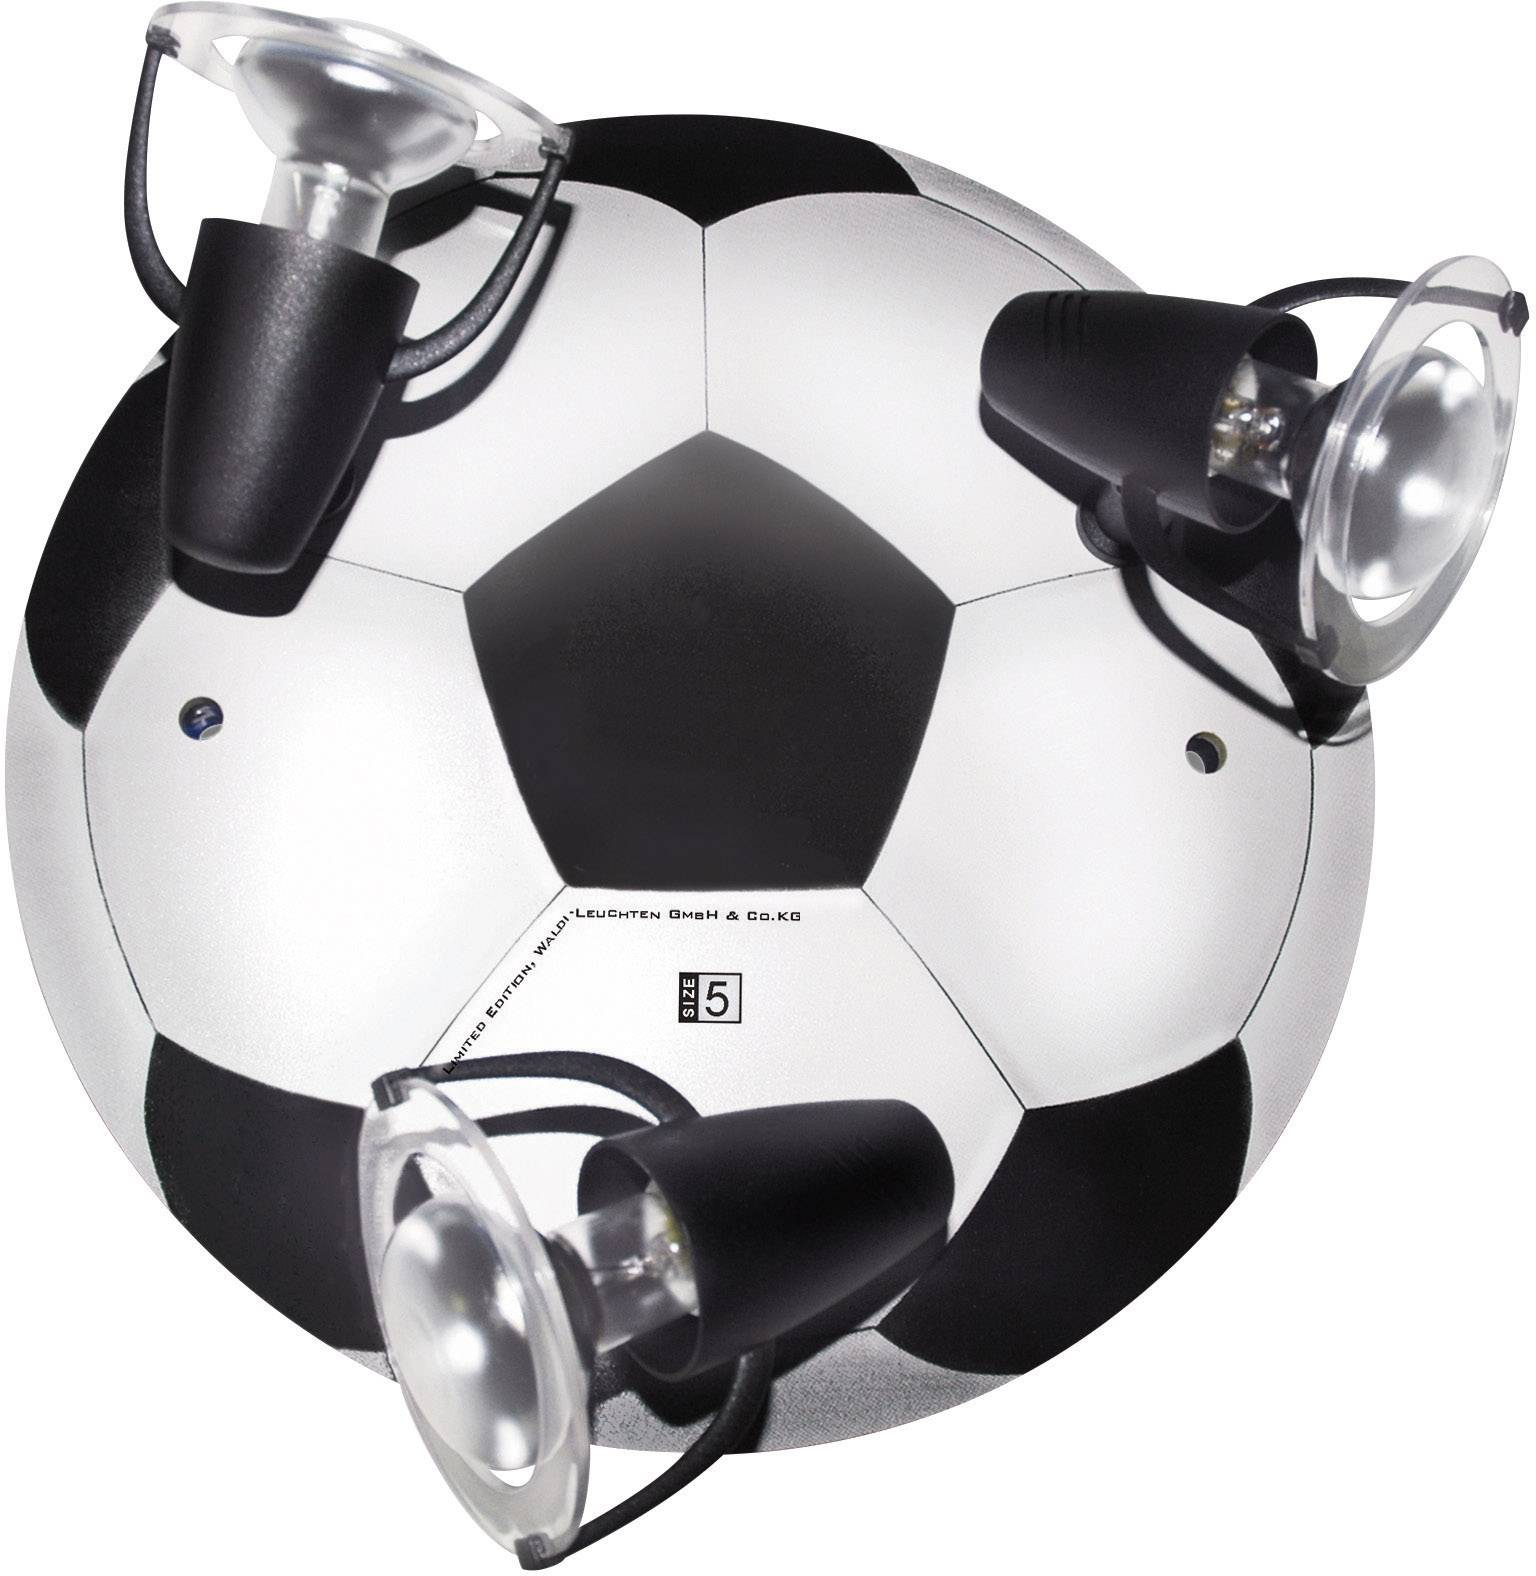 Stropná lampa futbal Waldi Leuchten Nogometna lopta 27403, E14, 27 W, s úspornou žiarovkou, čiernobiela